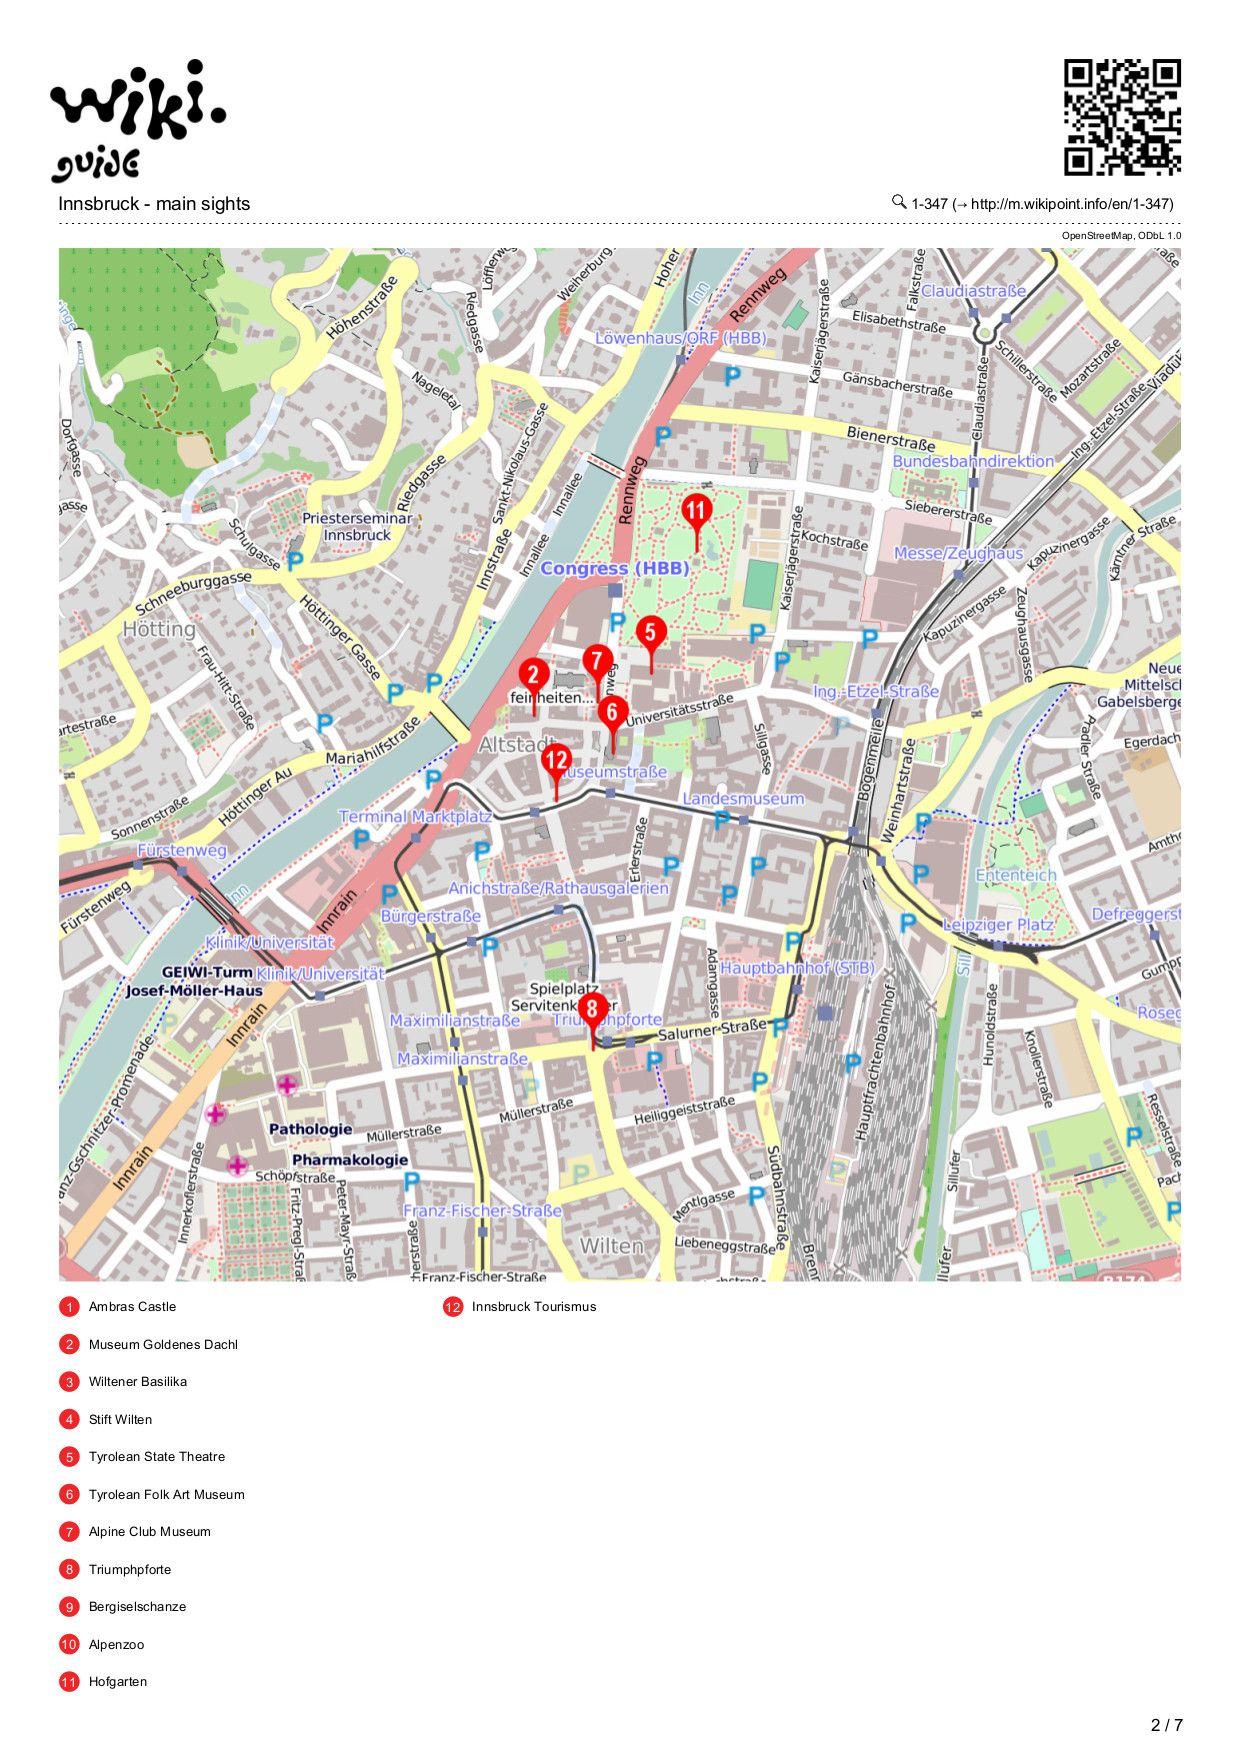 Map of Innsbruck | Innsbruck - main sights | Pinterest | Innsbruck